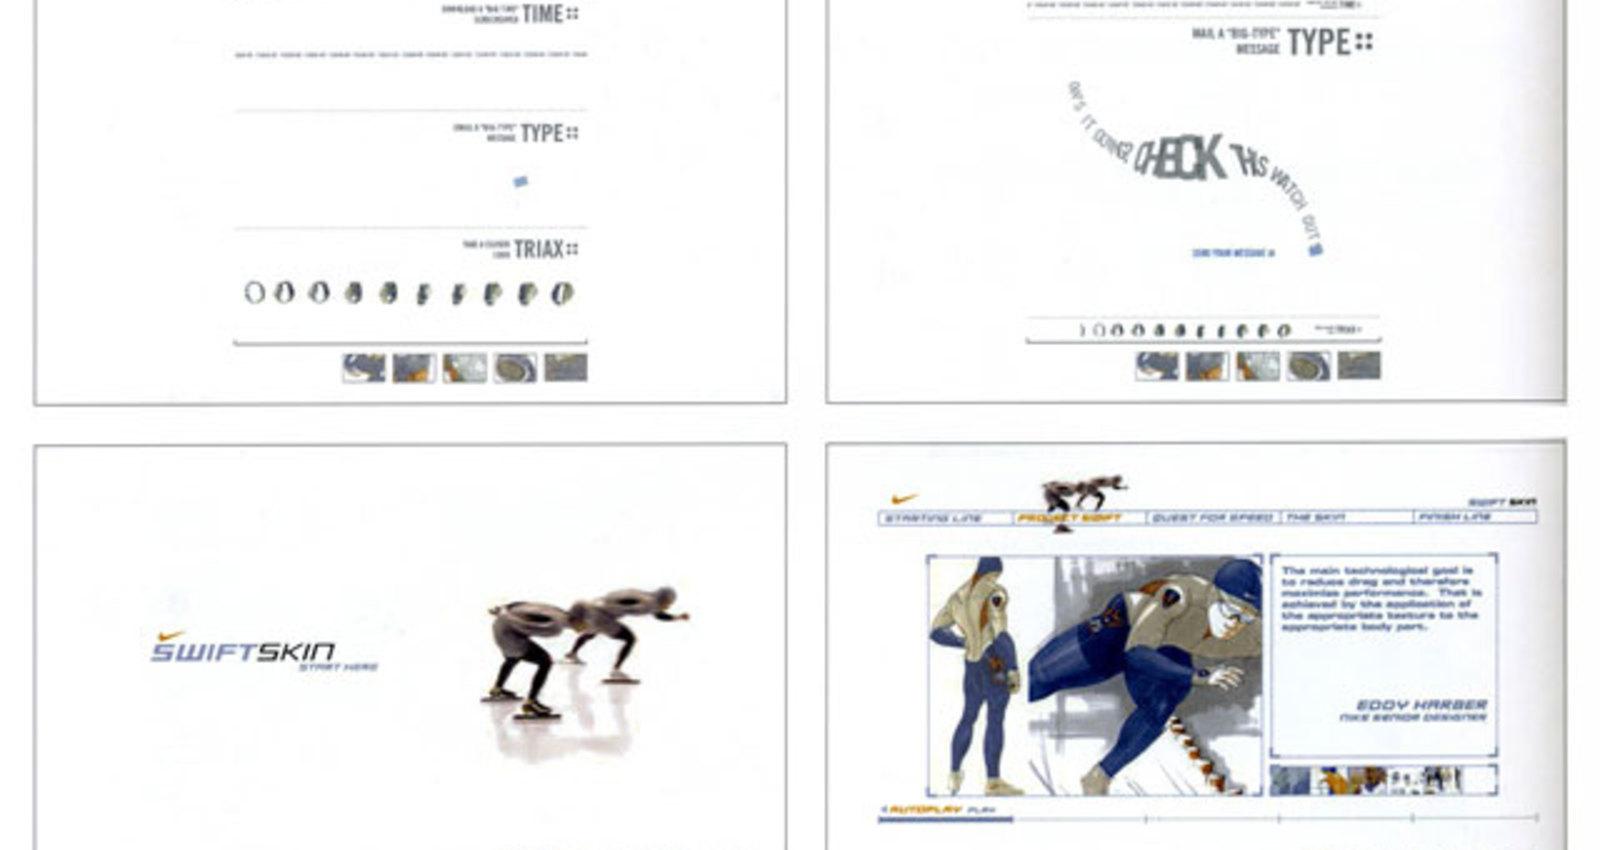 Nike Triax Speed/Stamina Module